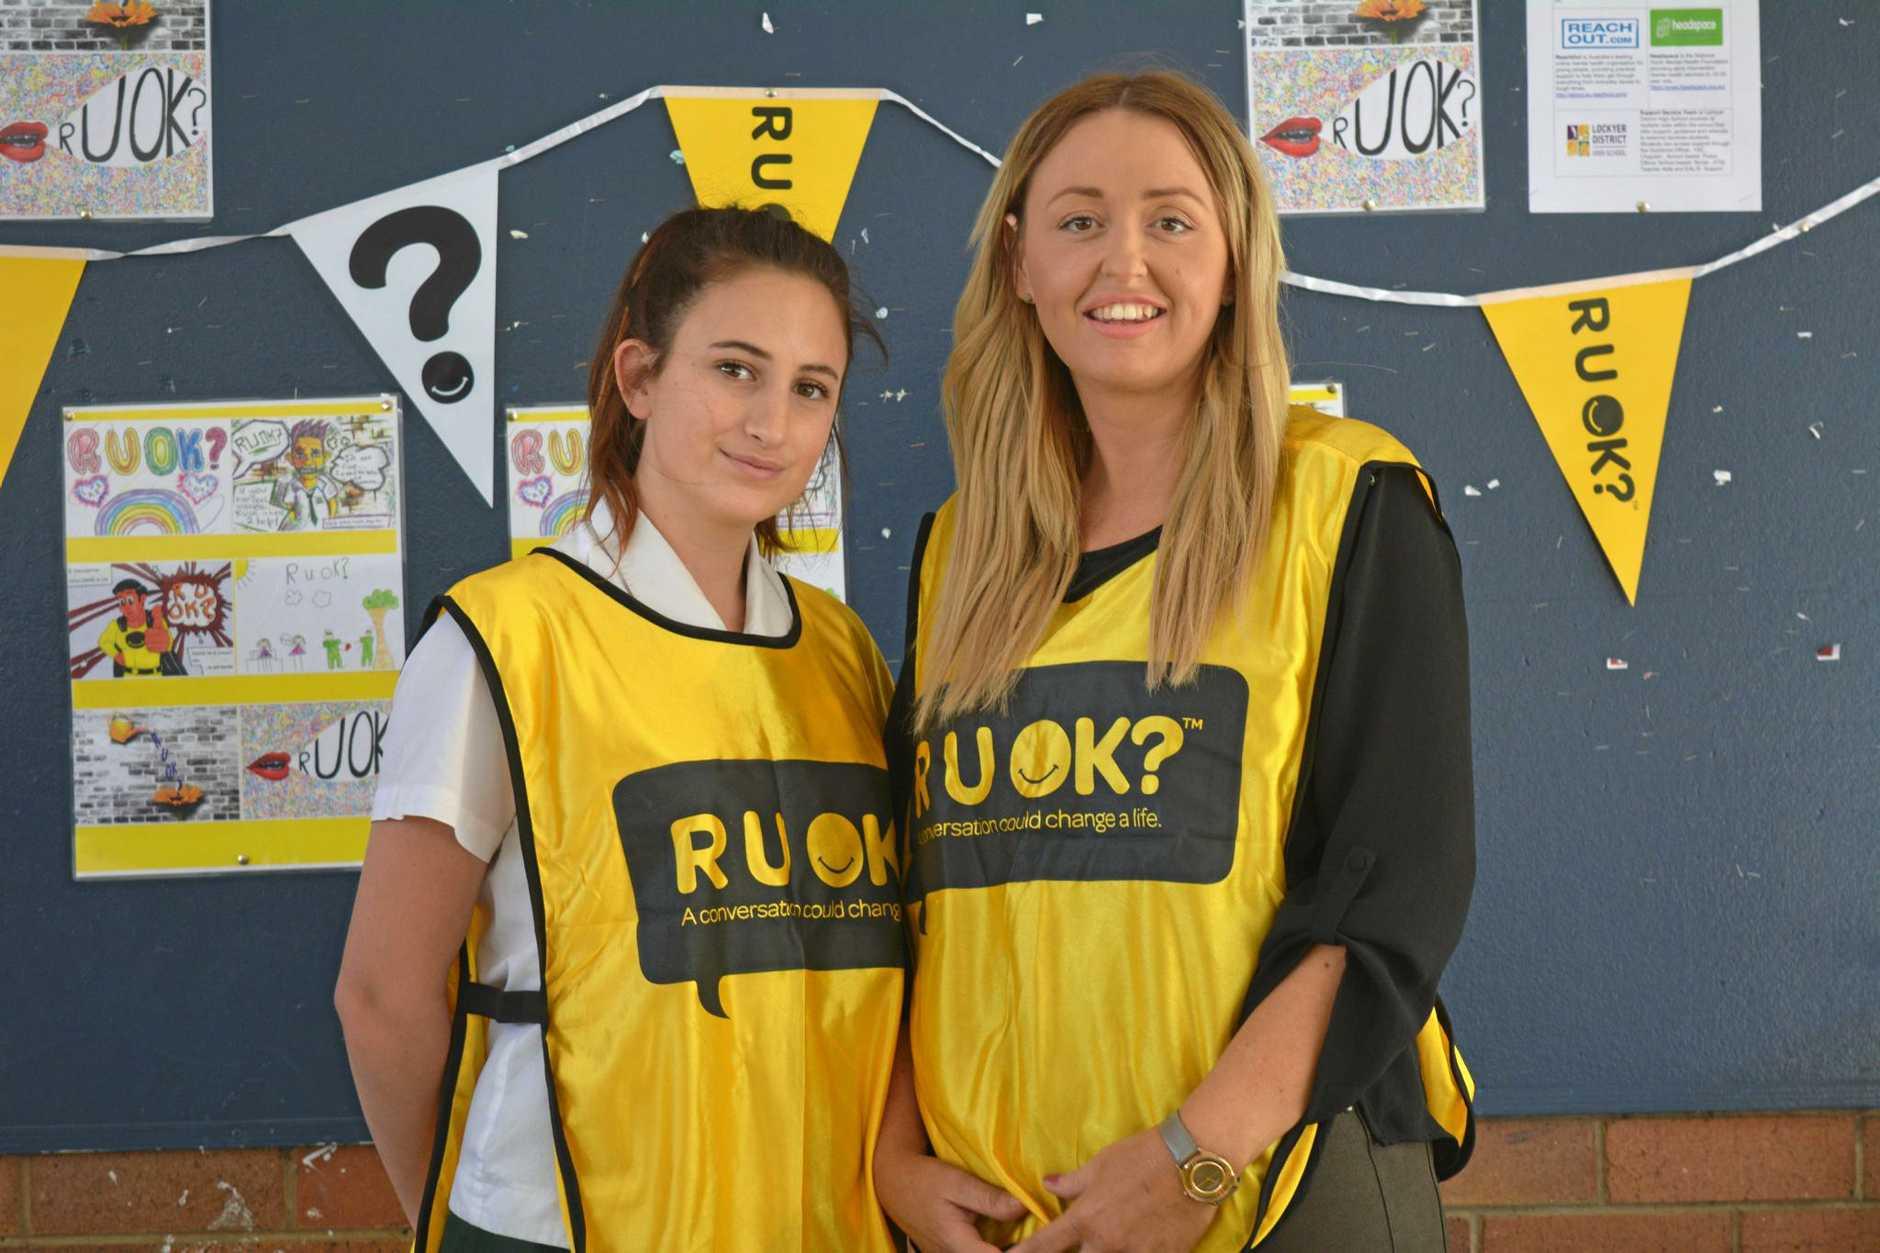 Amber Schroen and Silva Johansen organised the R U OK? Day stall.